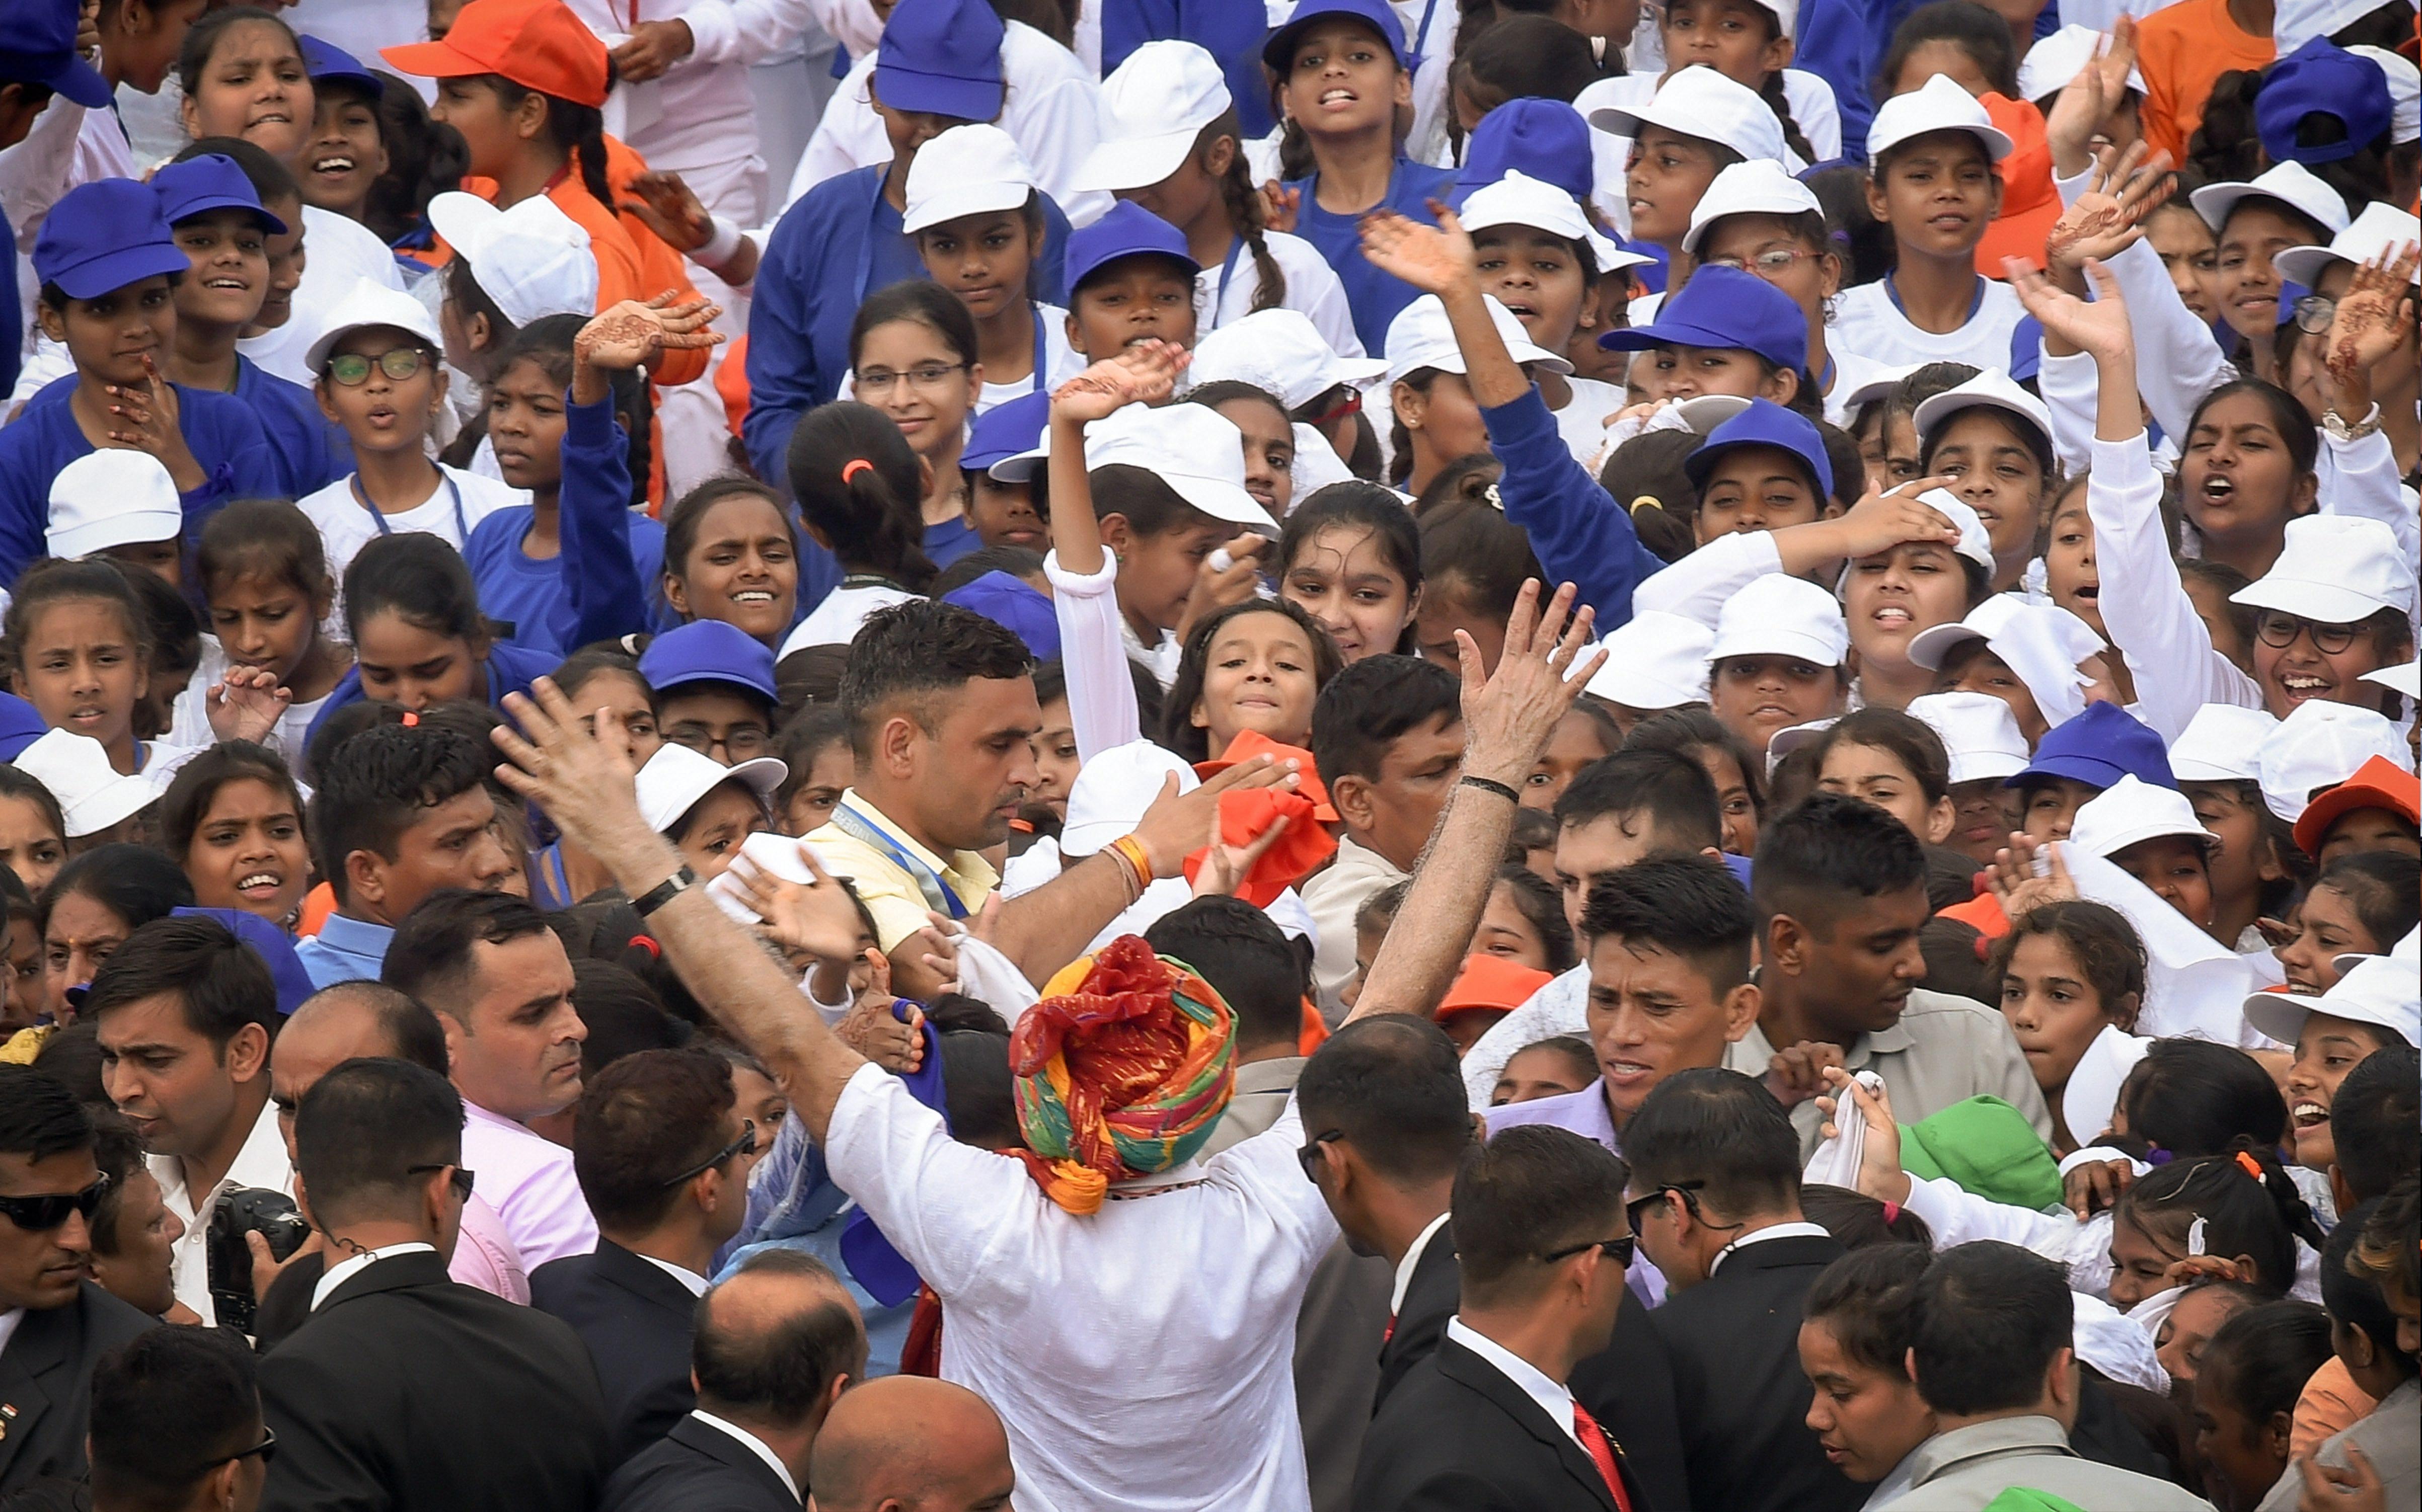 Population explosion: What Modi said